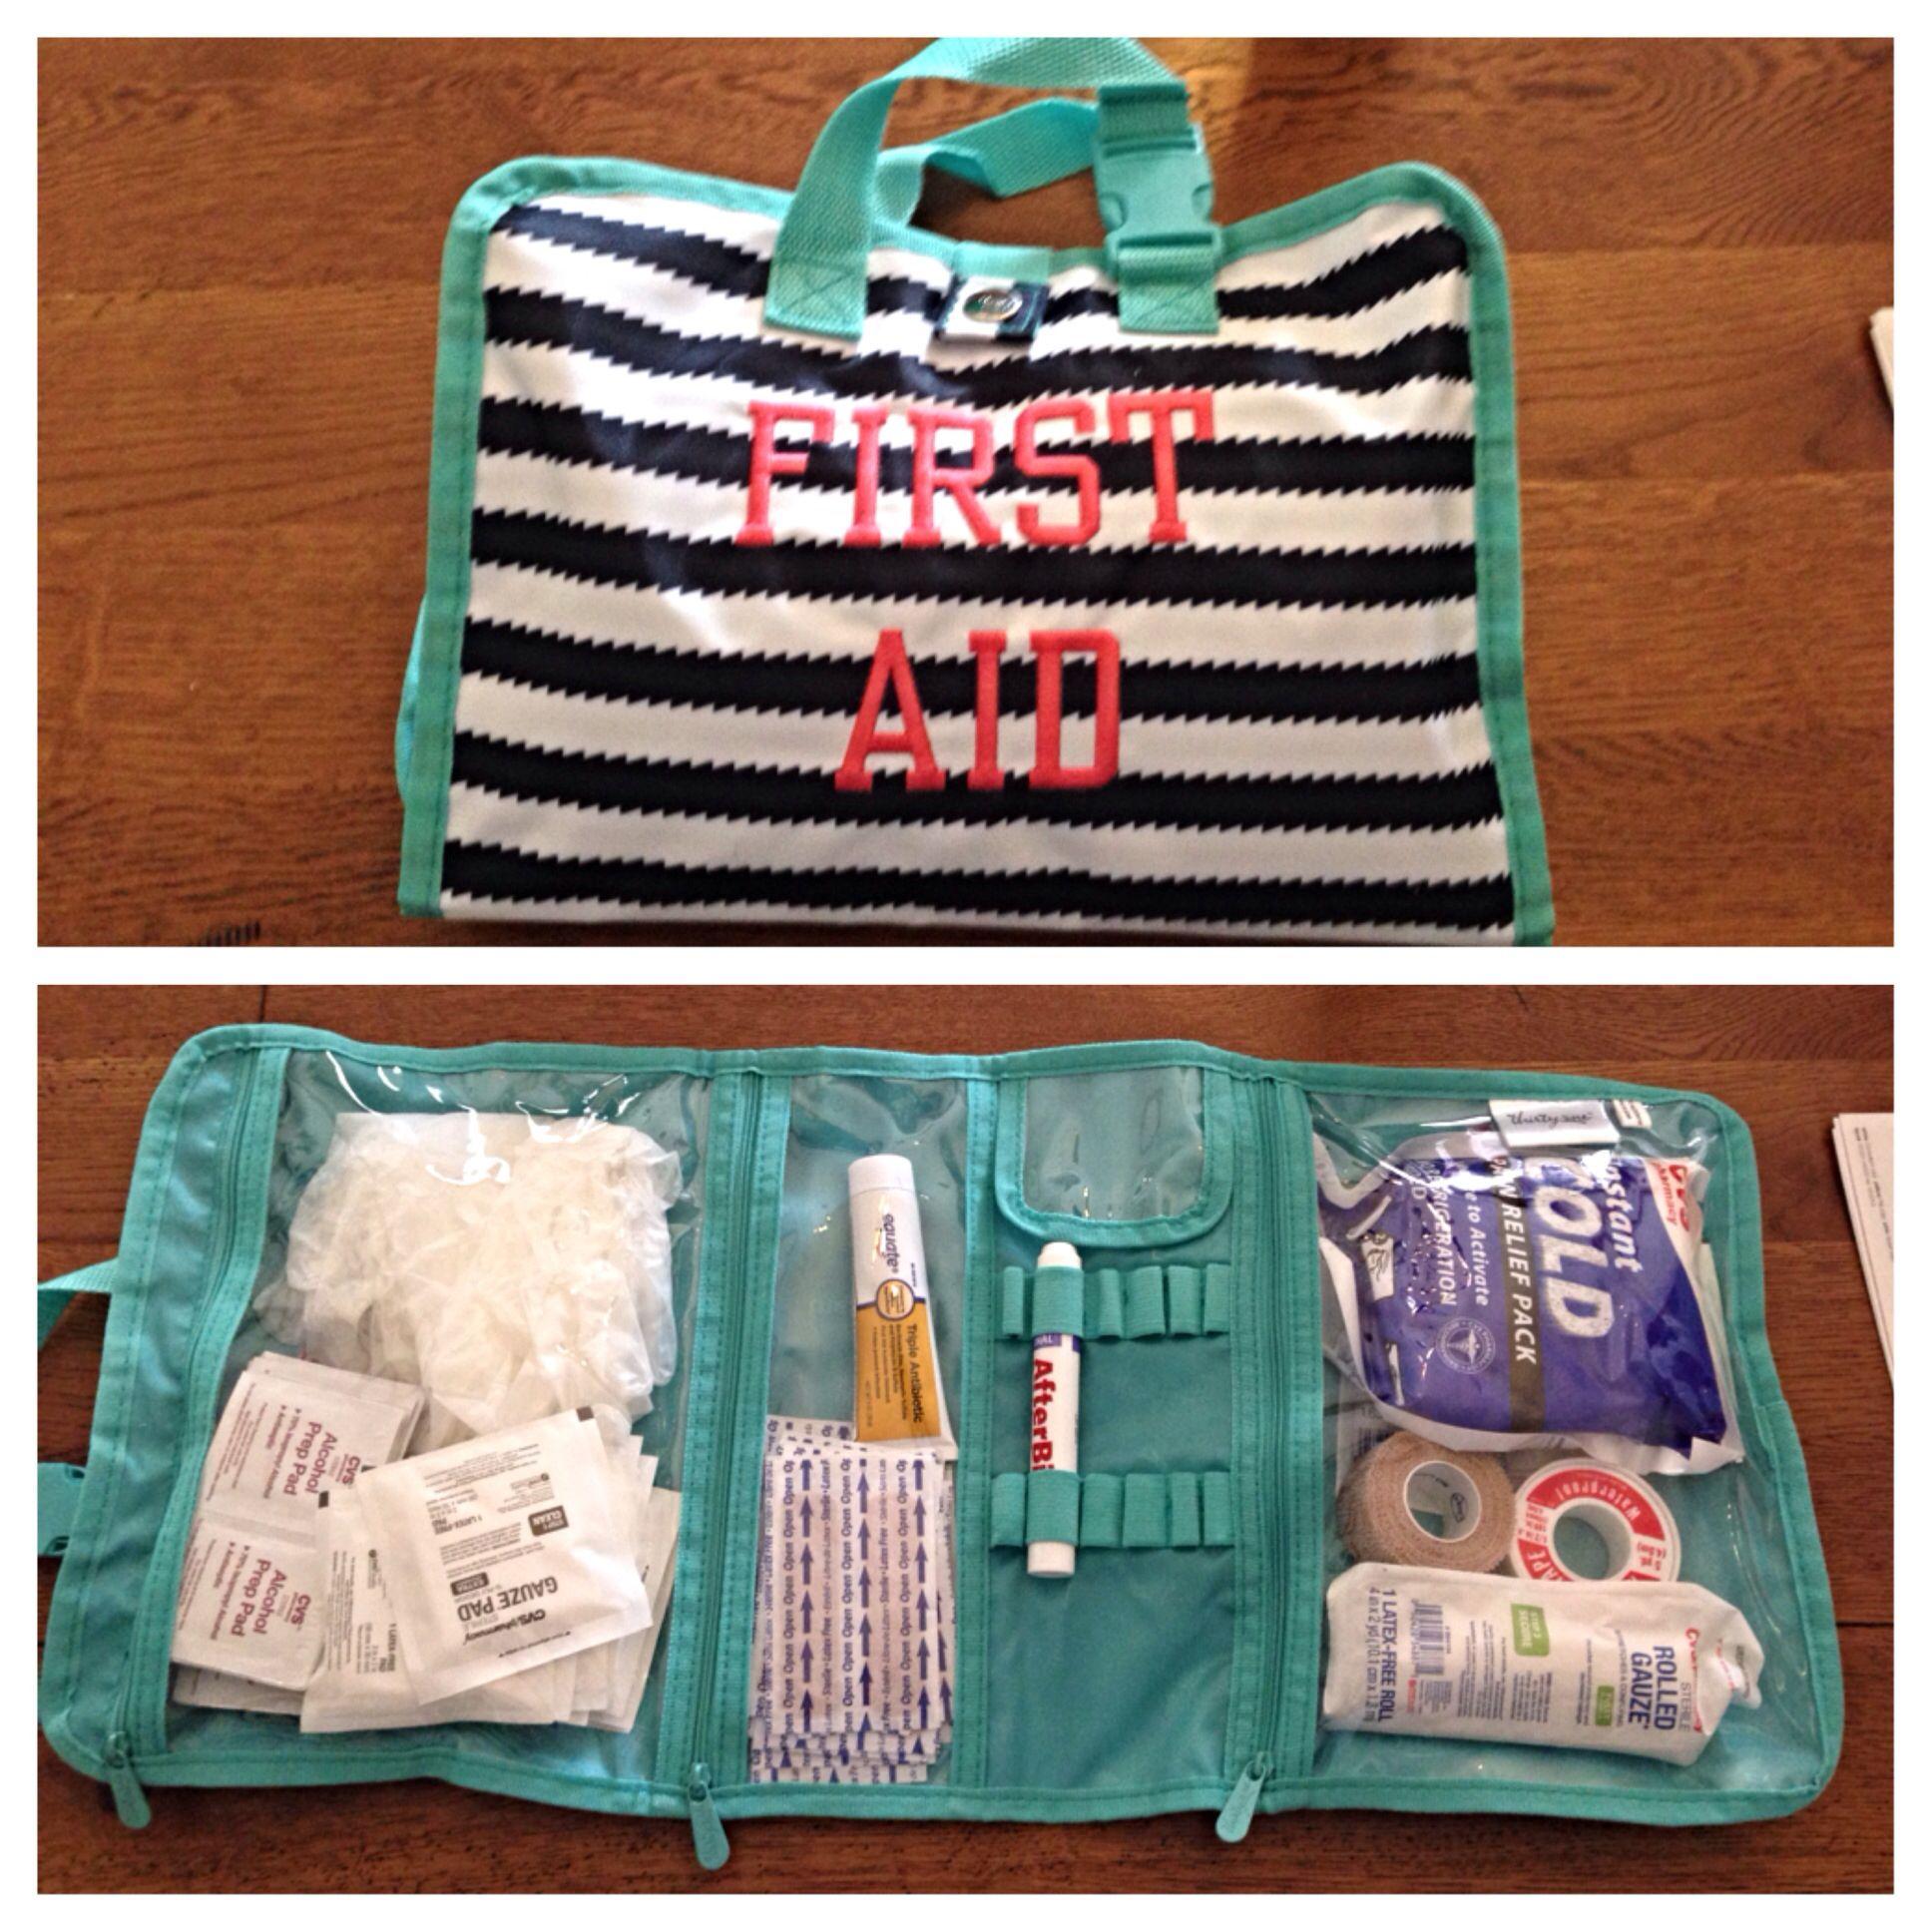 Timeless Beauty Bag as a first aid kit! www.mythirtyone